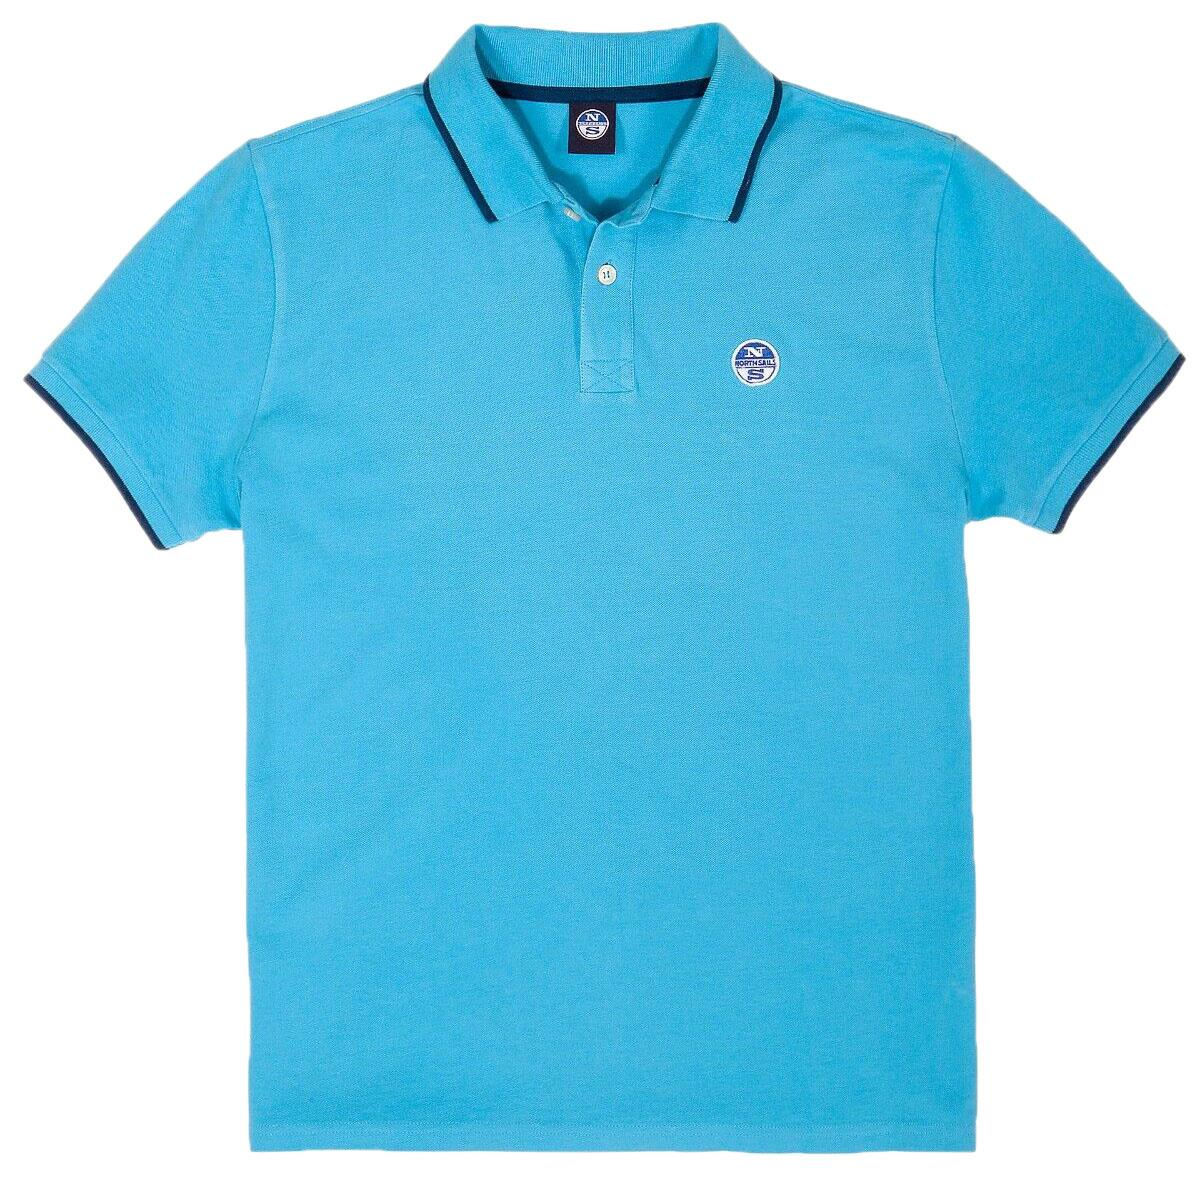 NORTH-SAILS-Mens-Legacy-Heritage-Short-Sleeve-Polo-Shirt-SALE-RRP-50 thumbnail 80